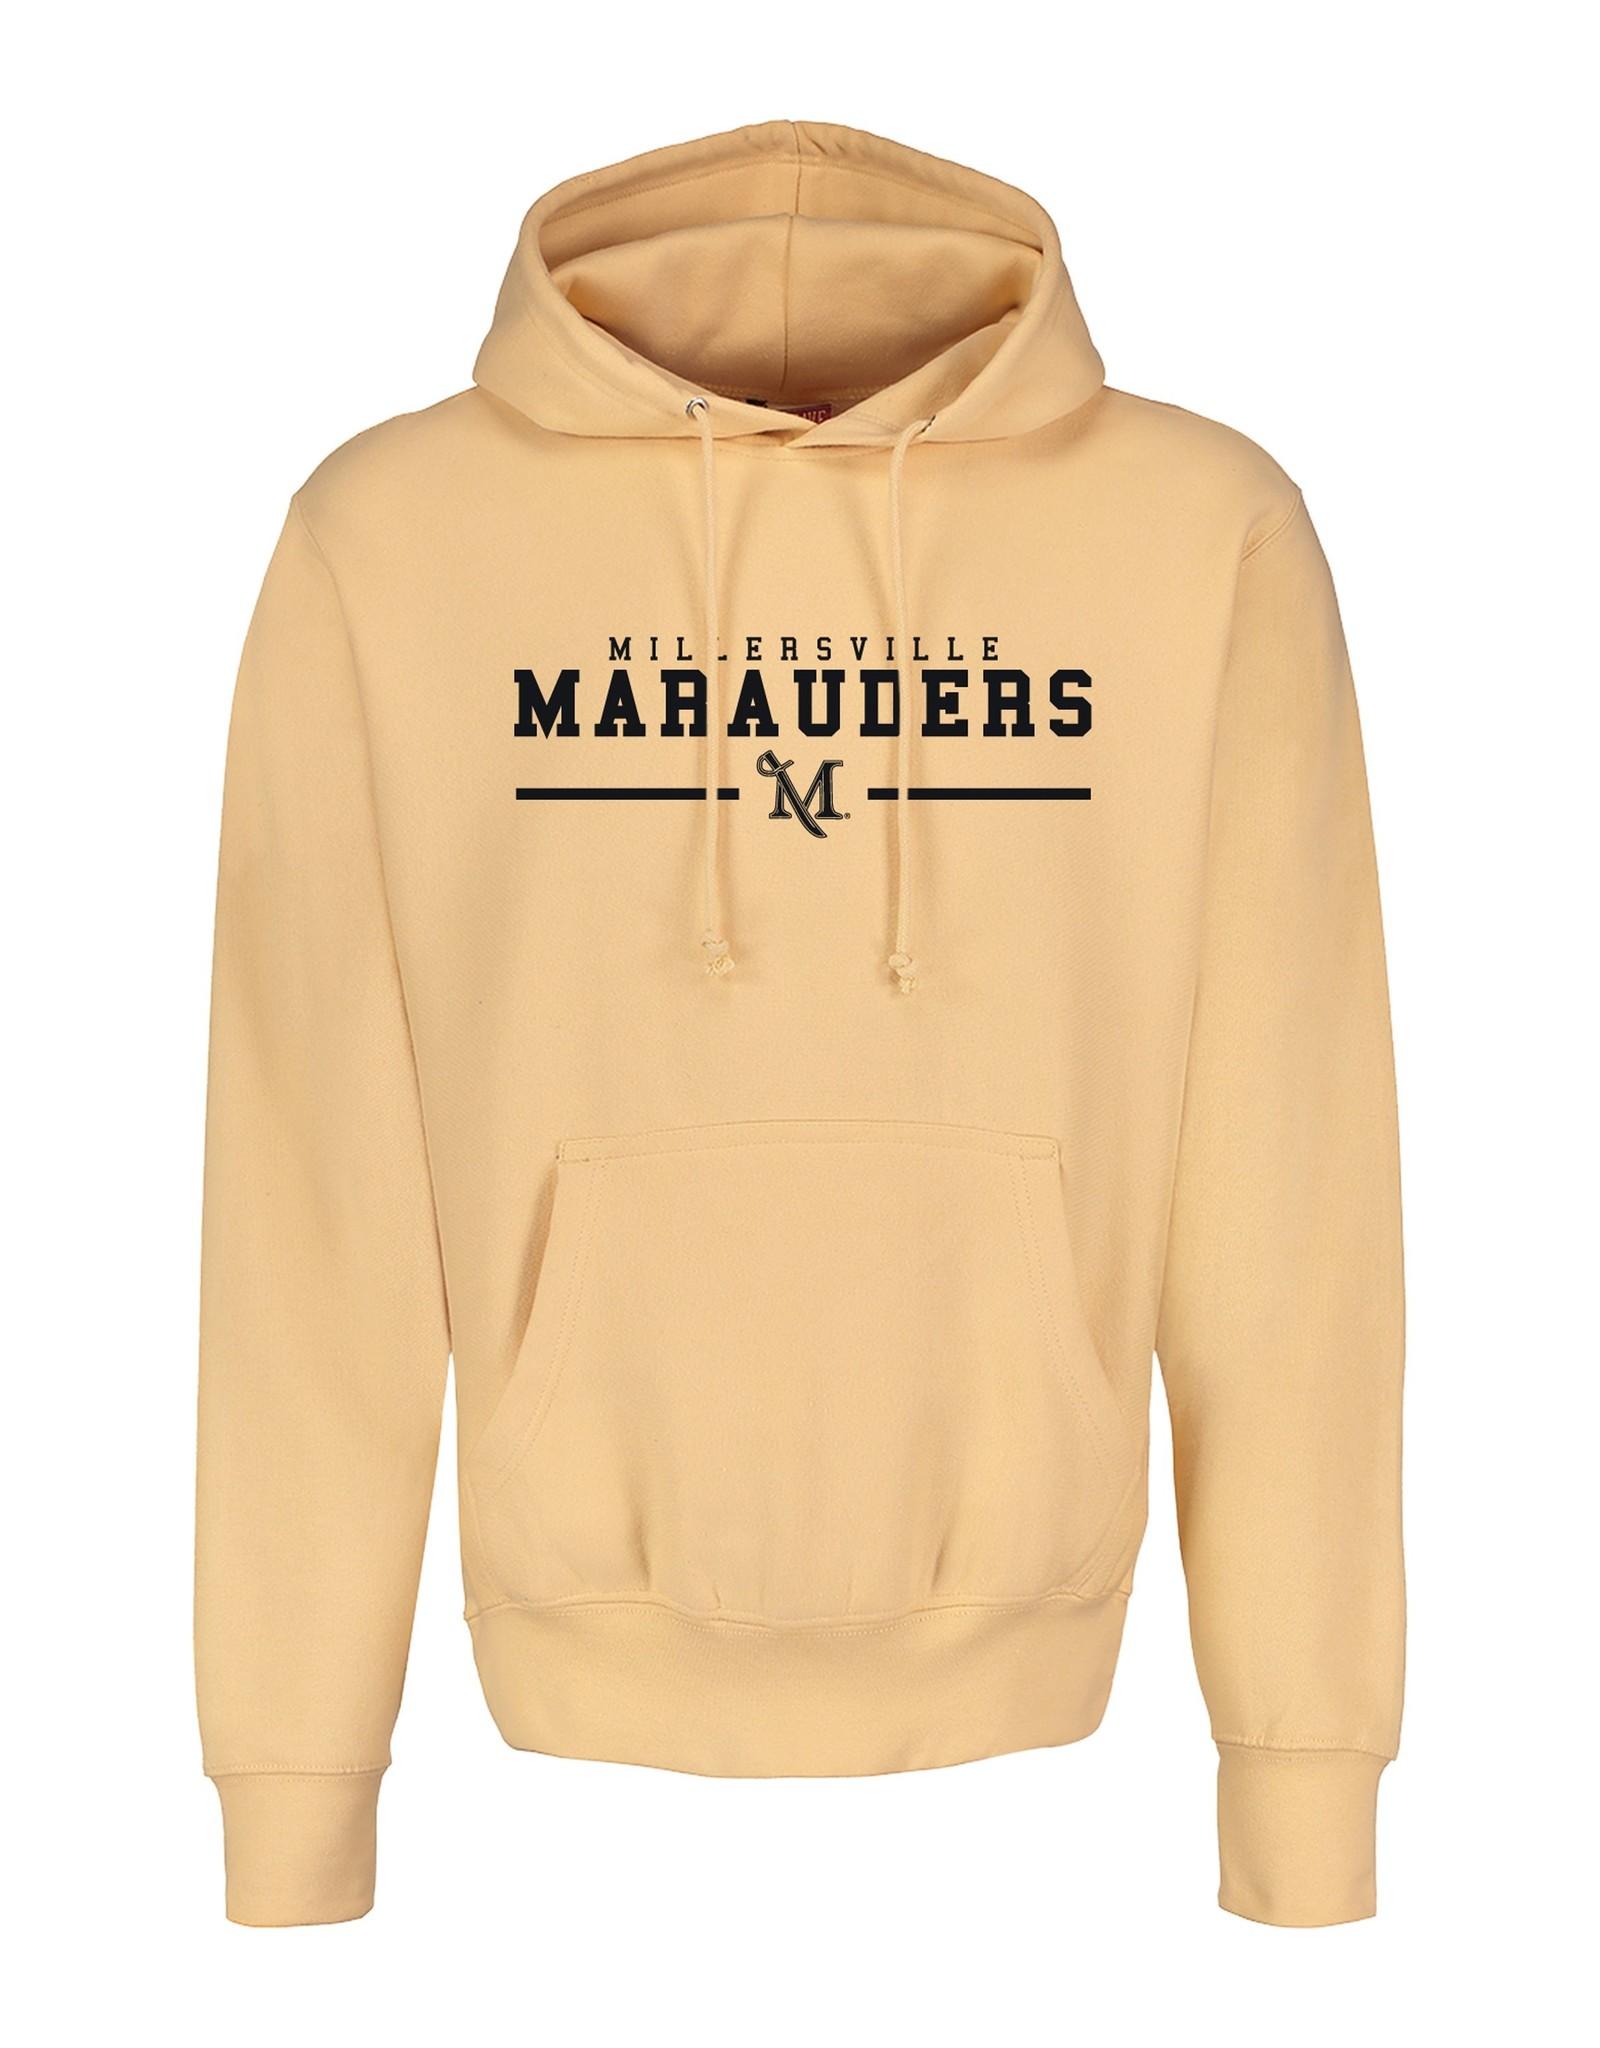 Light Gold Proweave Hooded Sweatshirt